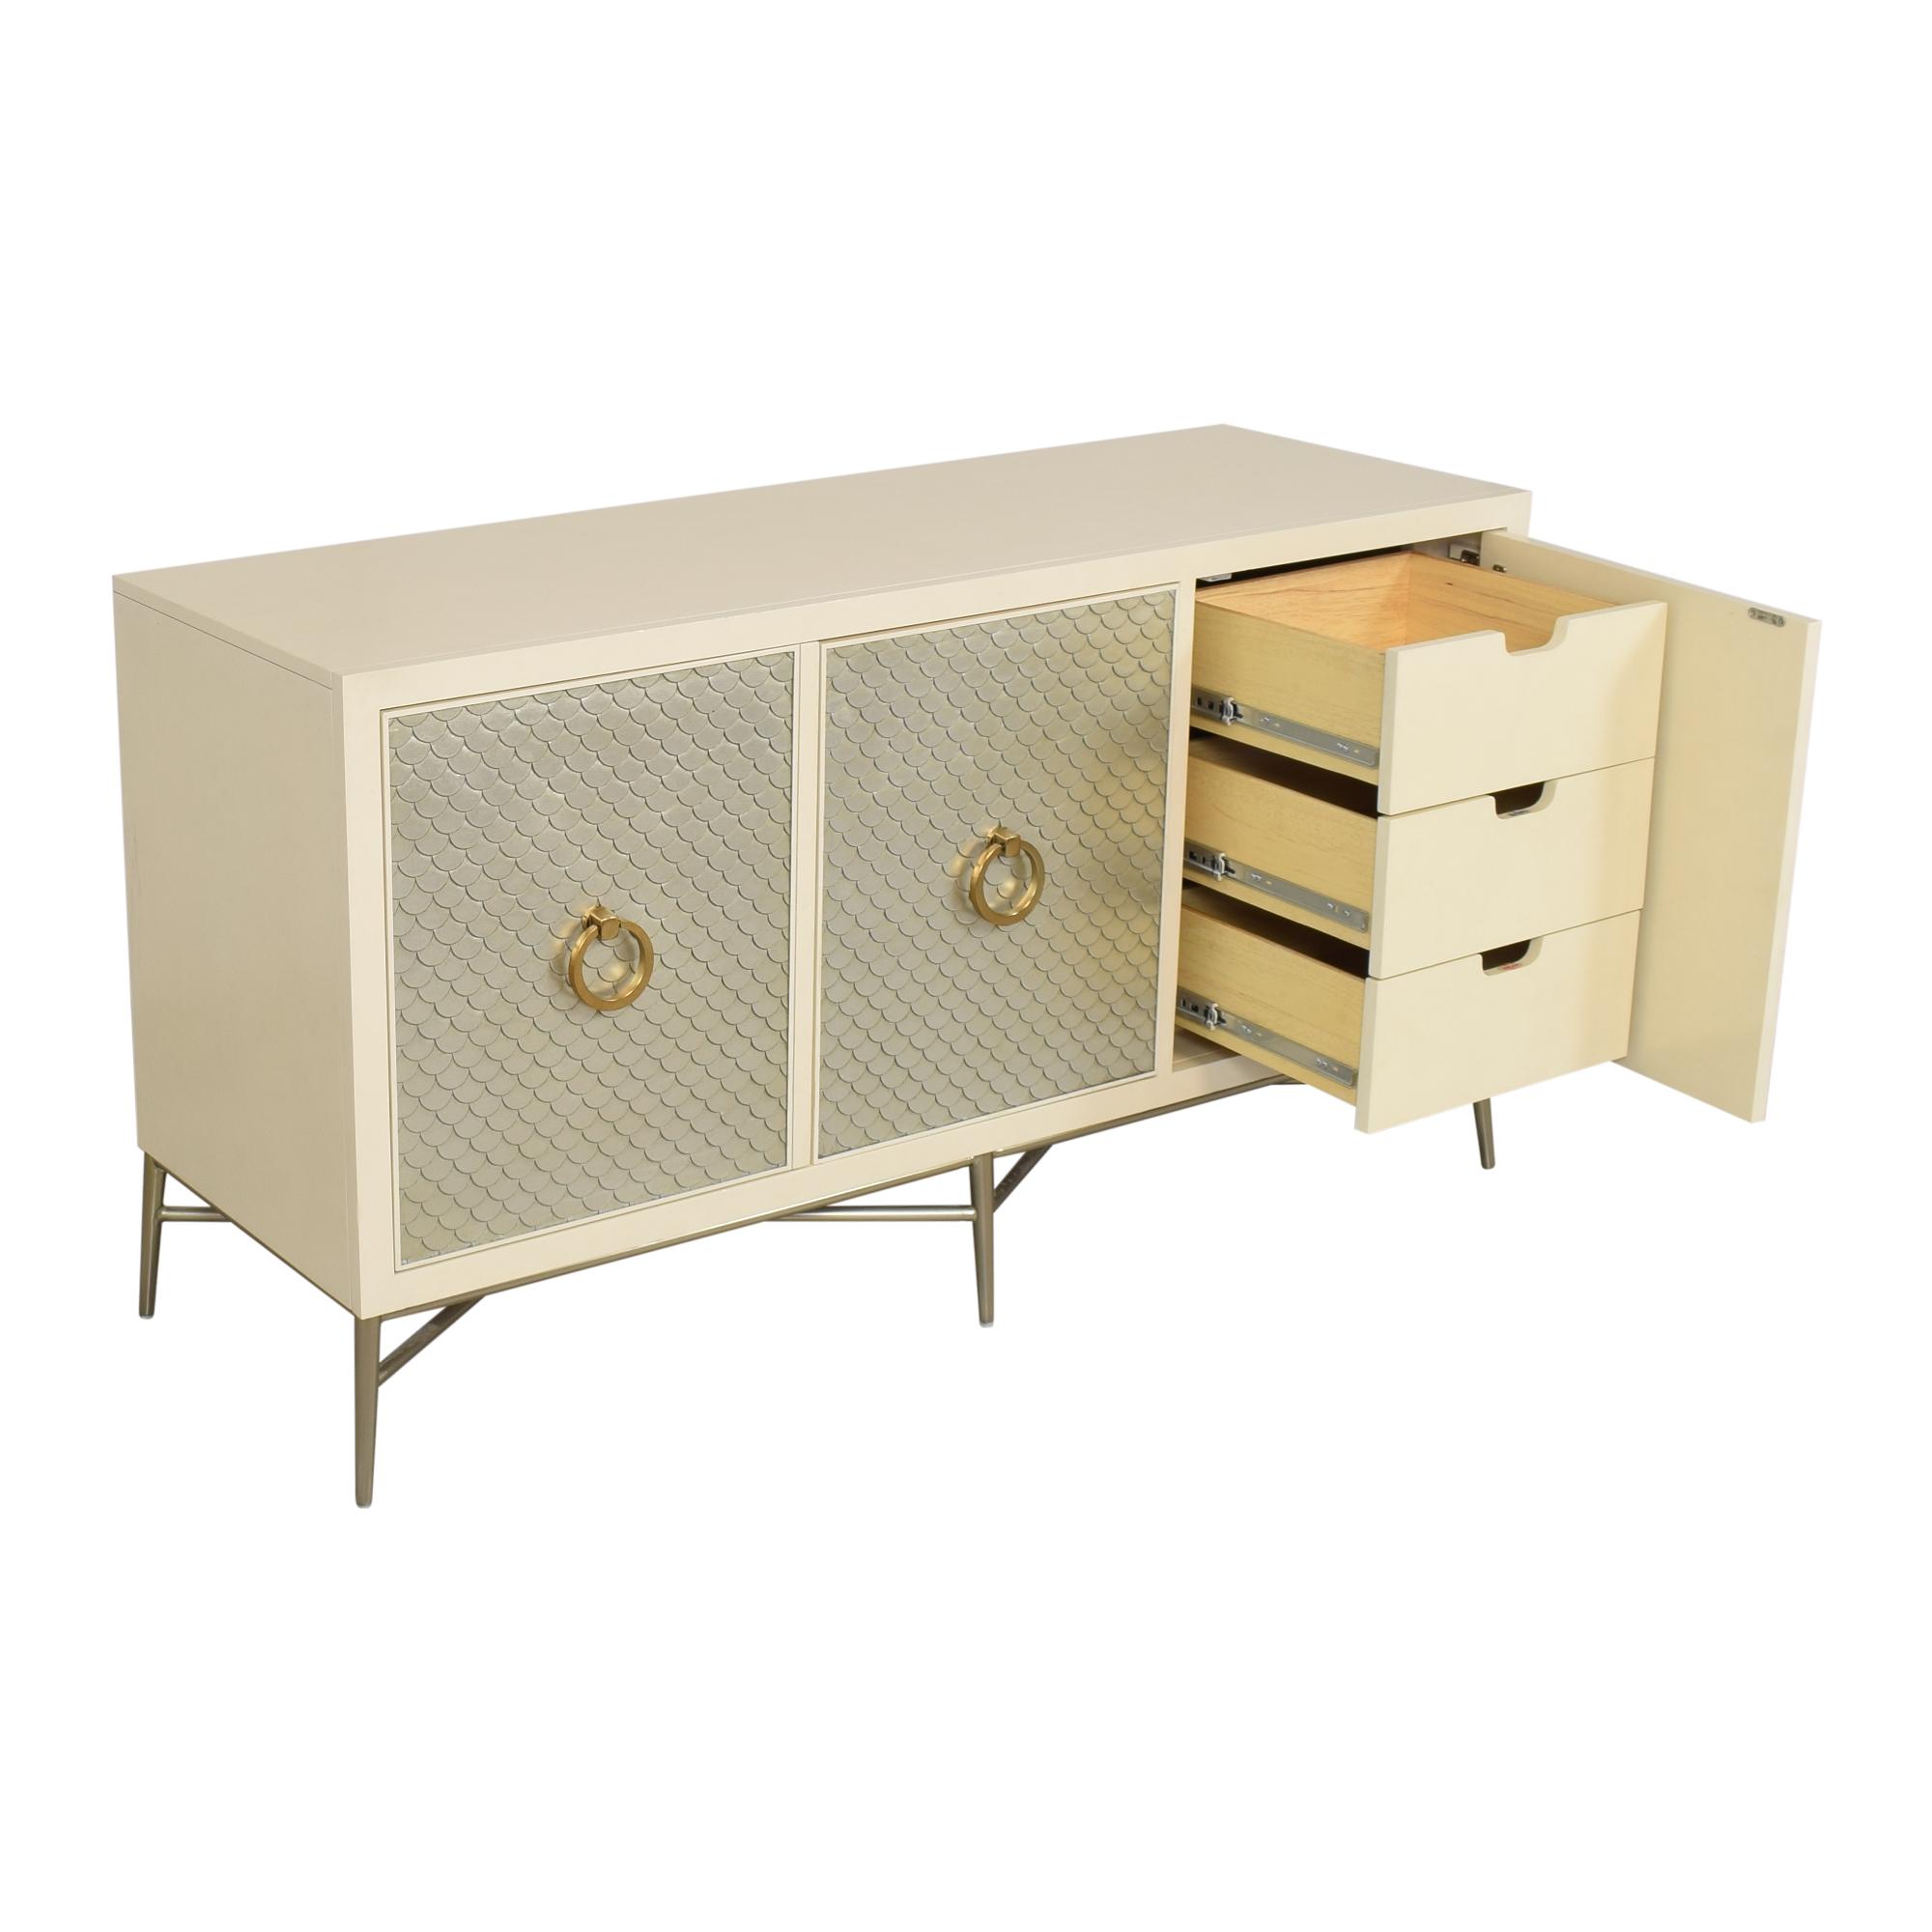 Bernhardt Bernhardt Salon Sideboard Cabinets & Sideboards